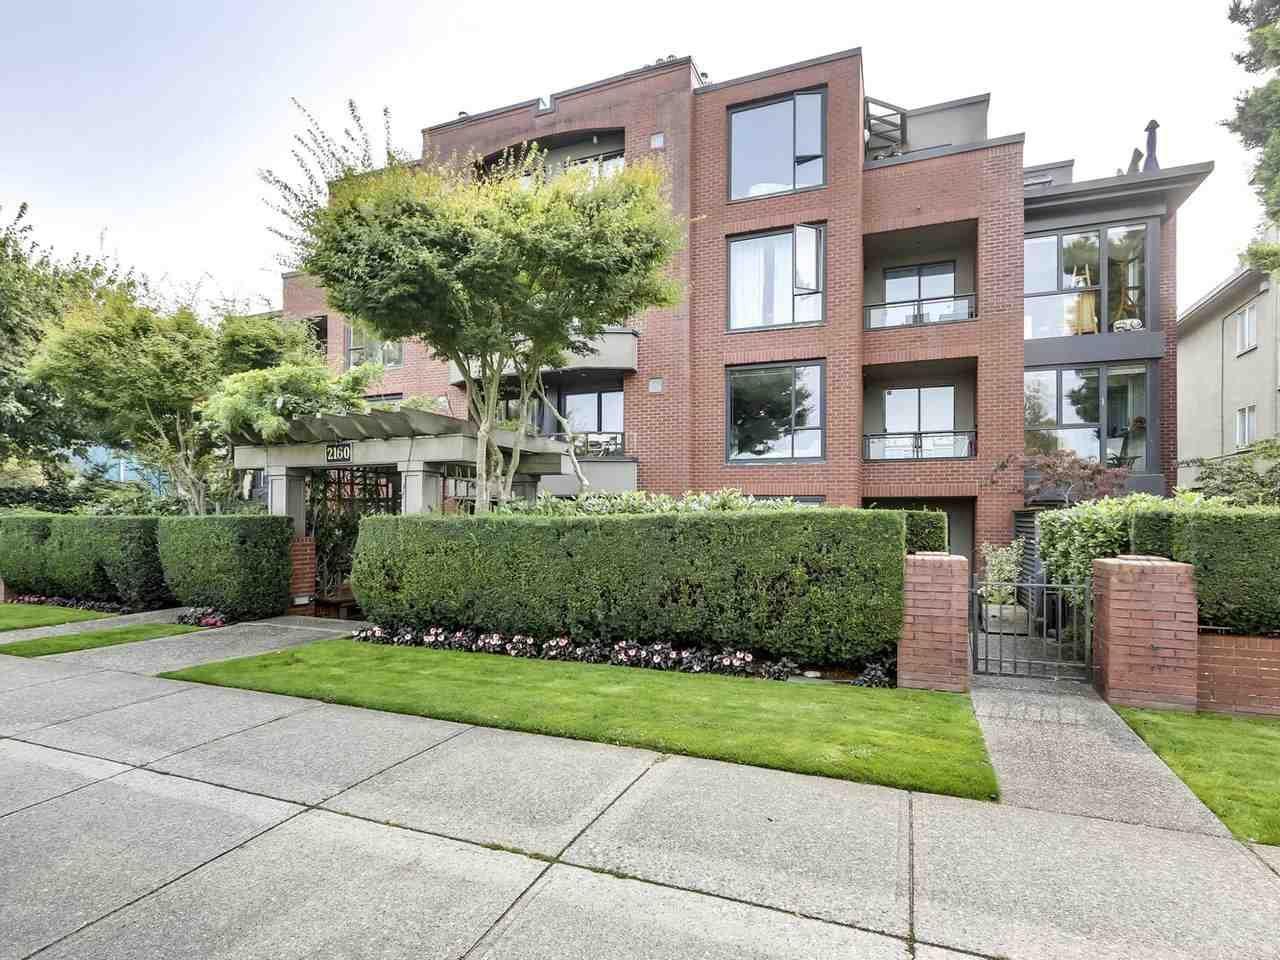 Main Photo: 203 2160 CORNWALL Avenue in Vancouver: Kitsilano Condo for sale (Vancouver West)  : MLS®# R2534768